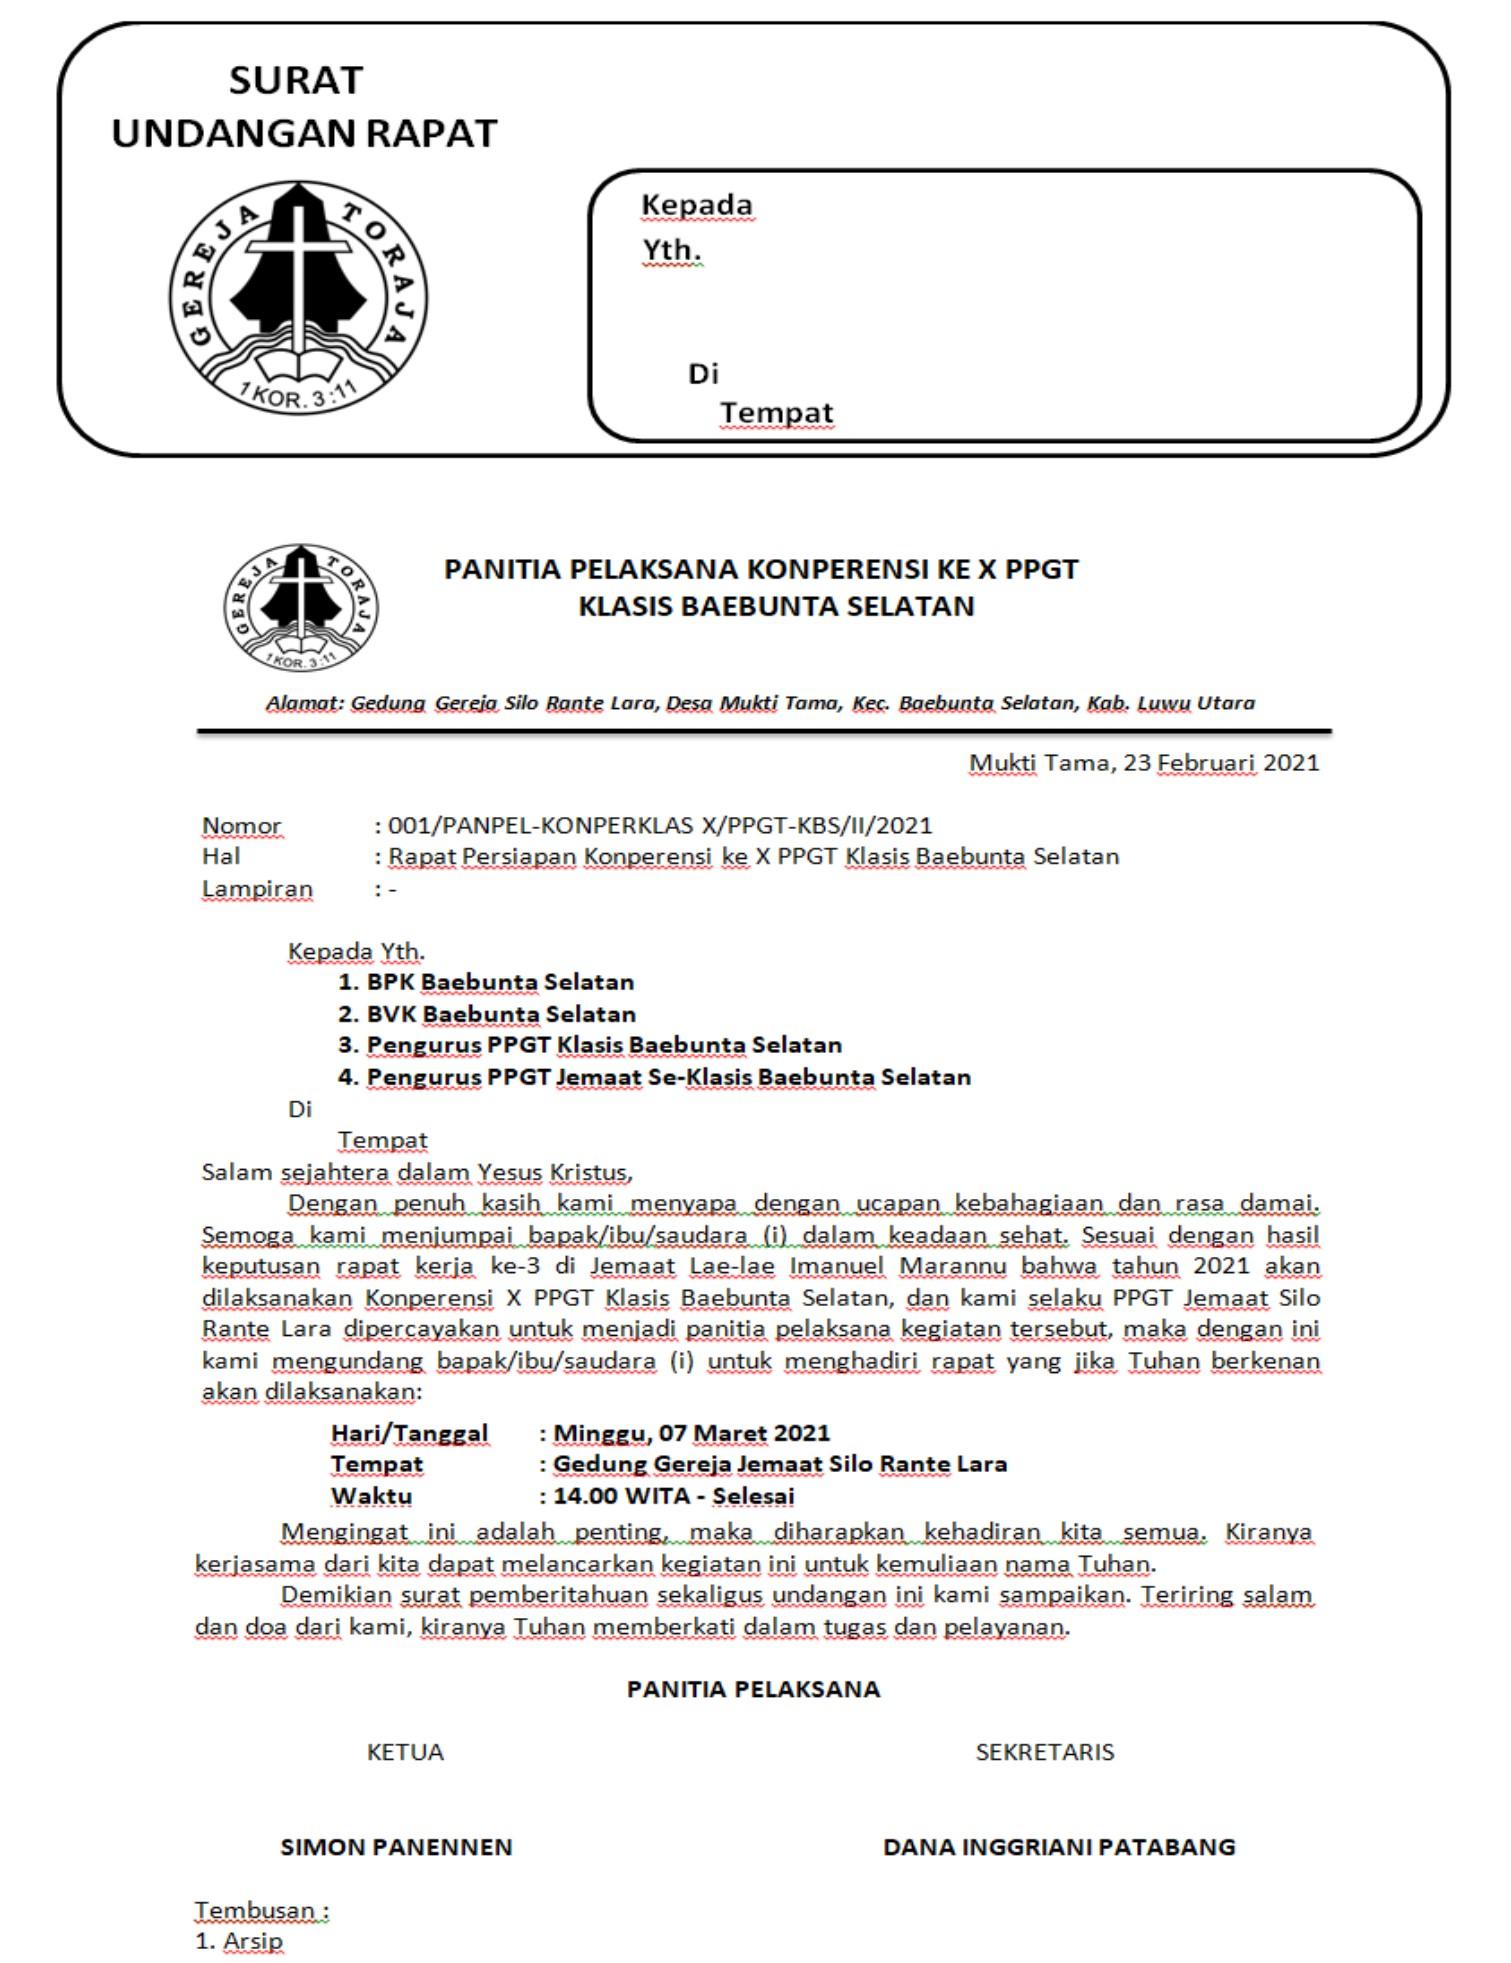 Contoh Surat Undangan Konperensi PPGT